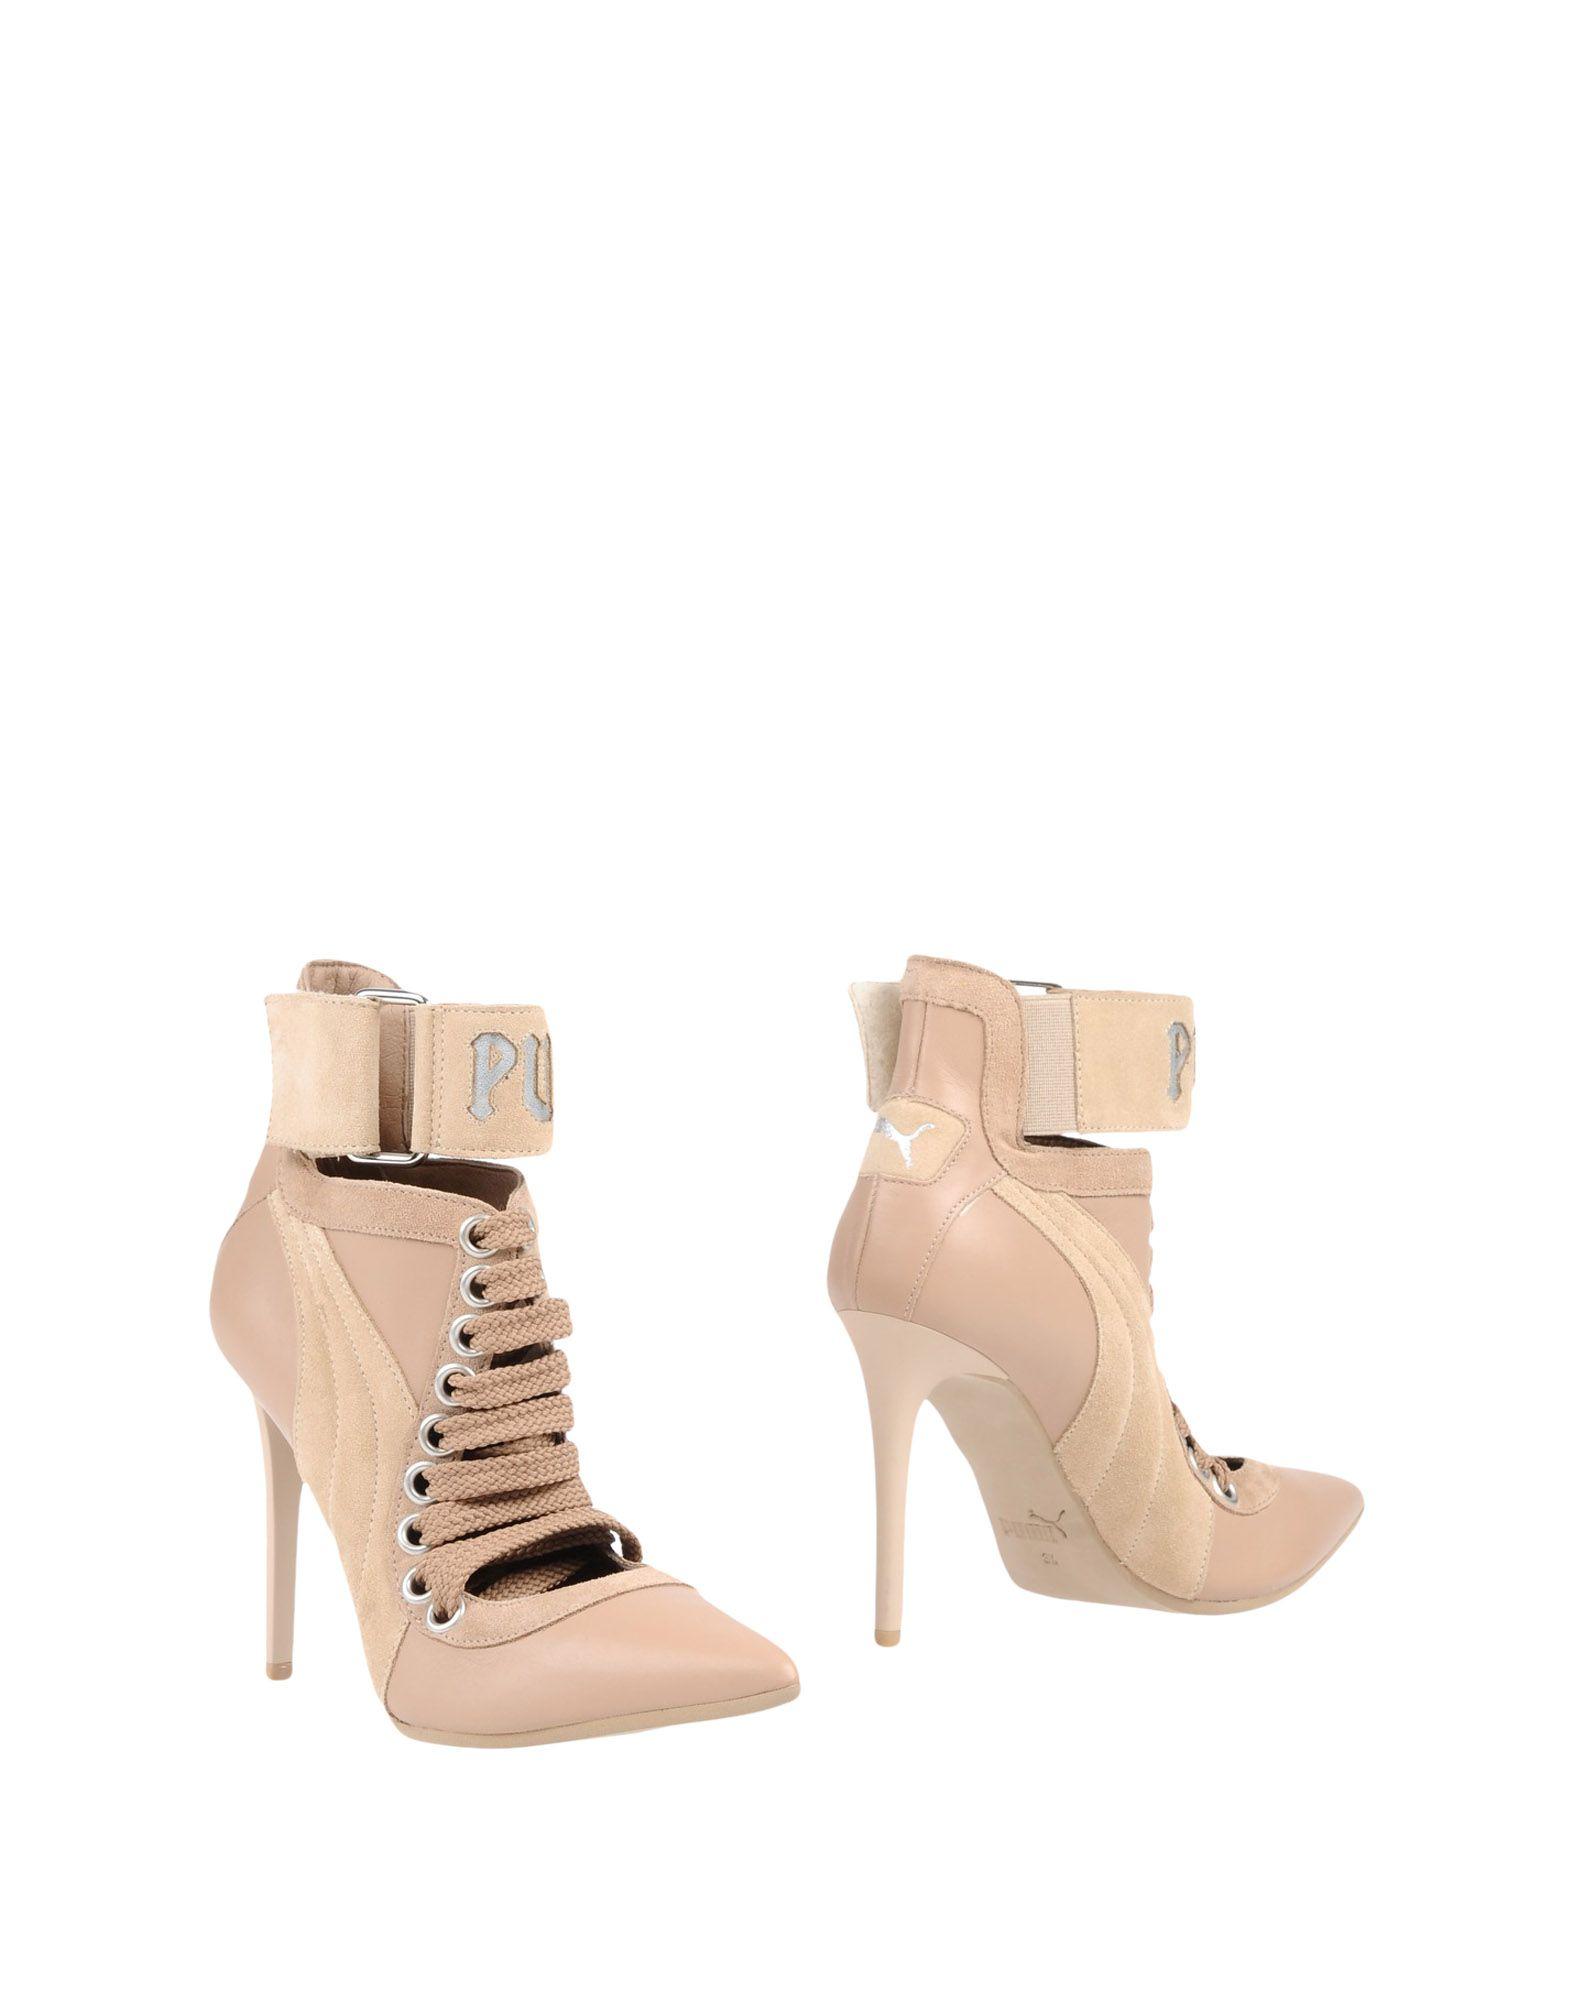 FENTY PUMA by RIHANNA Полусапоги и высокие ботинки rihanna x puma полусапоги и высокие ботинки